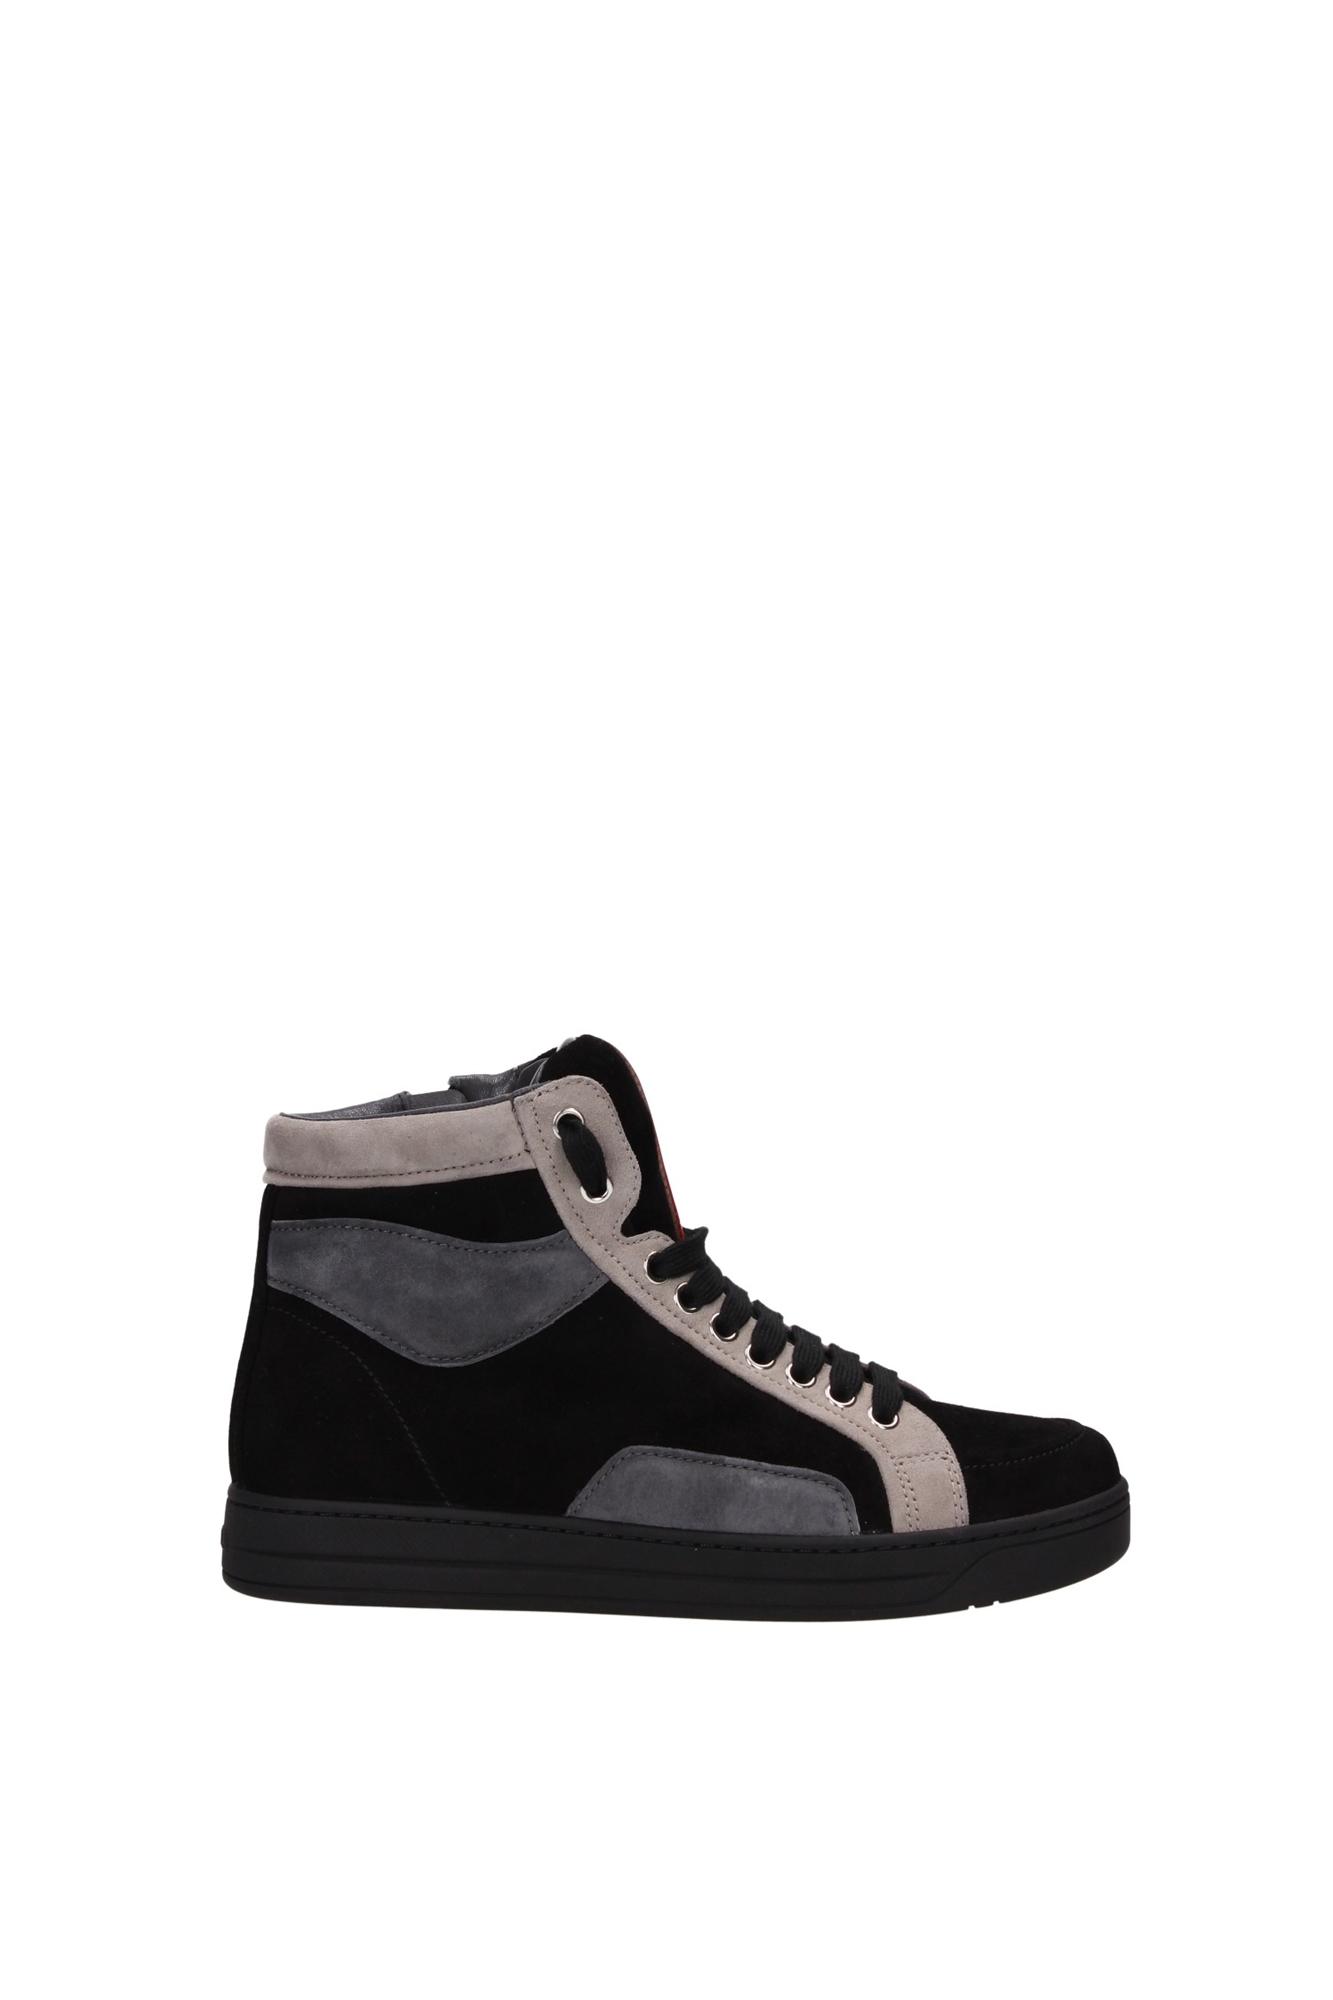 sneakers prada damen wildleder schwarz 3t5870neropomicenebbia. Black Bedroom Furniture Sets. Home Design Ideas